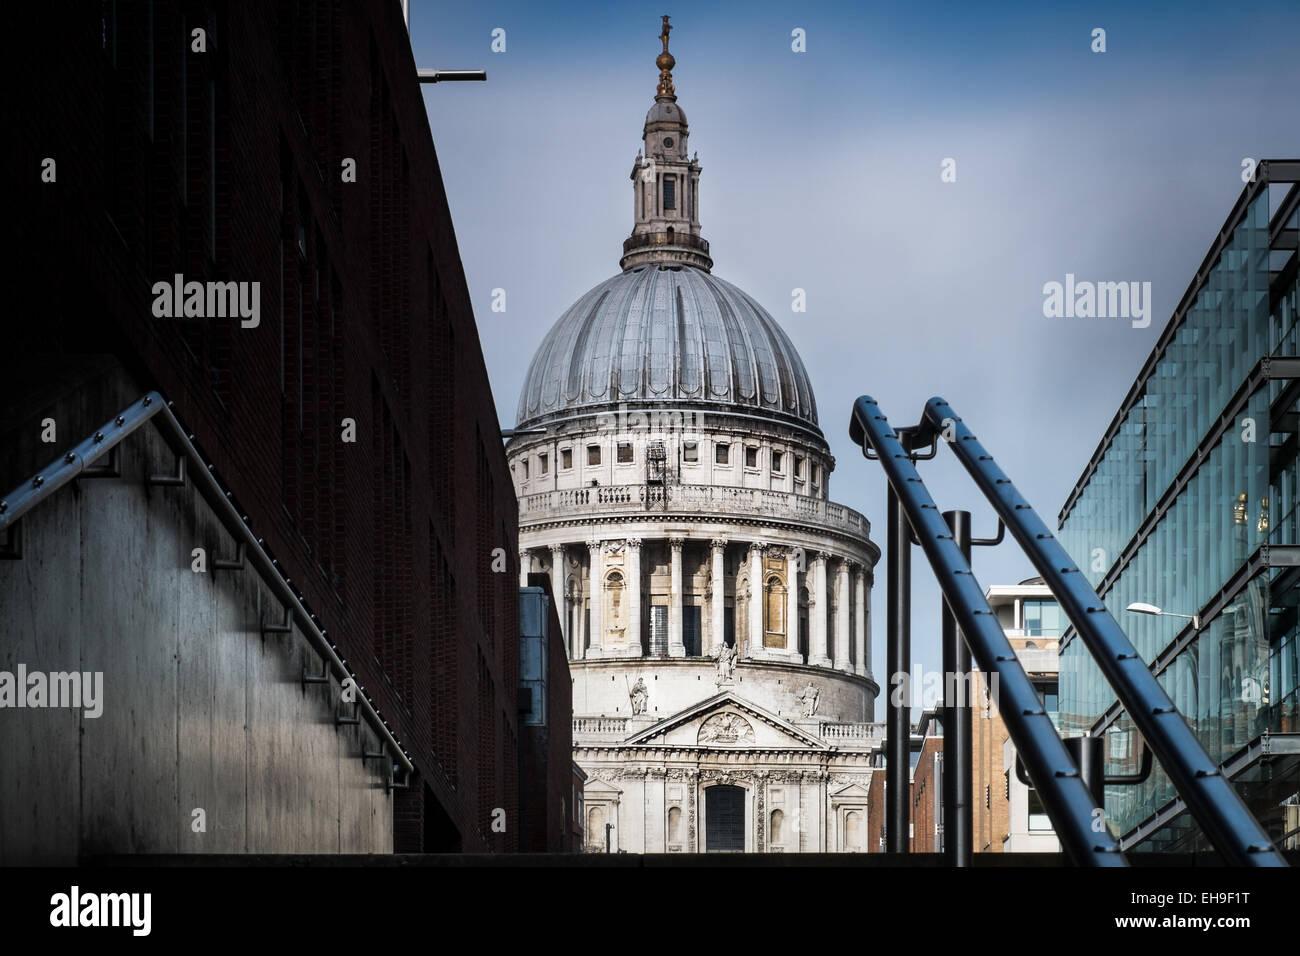 St. Pauls Cathedral, London Stockbild